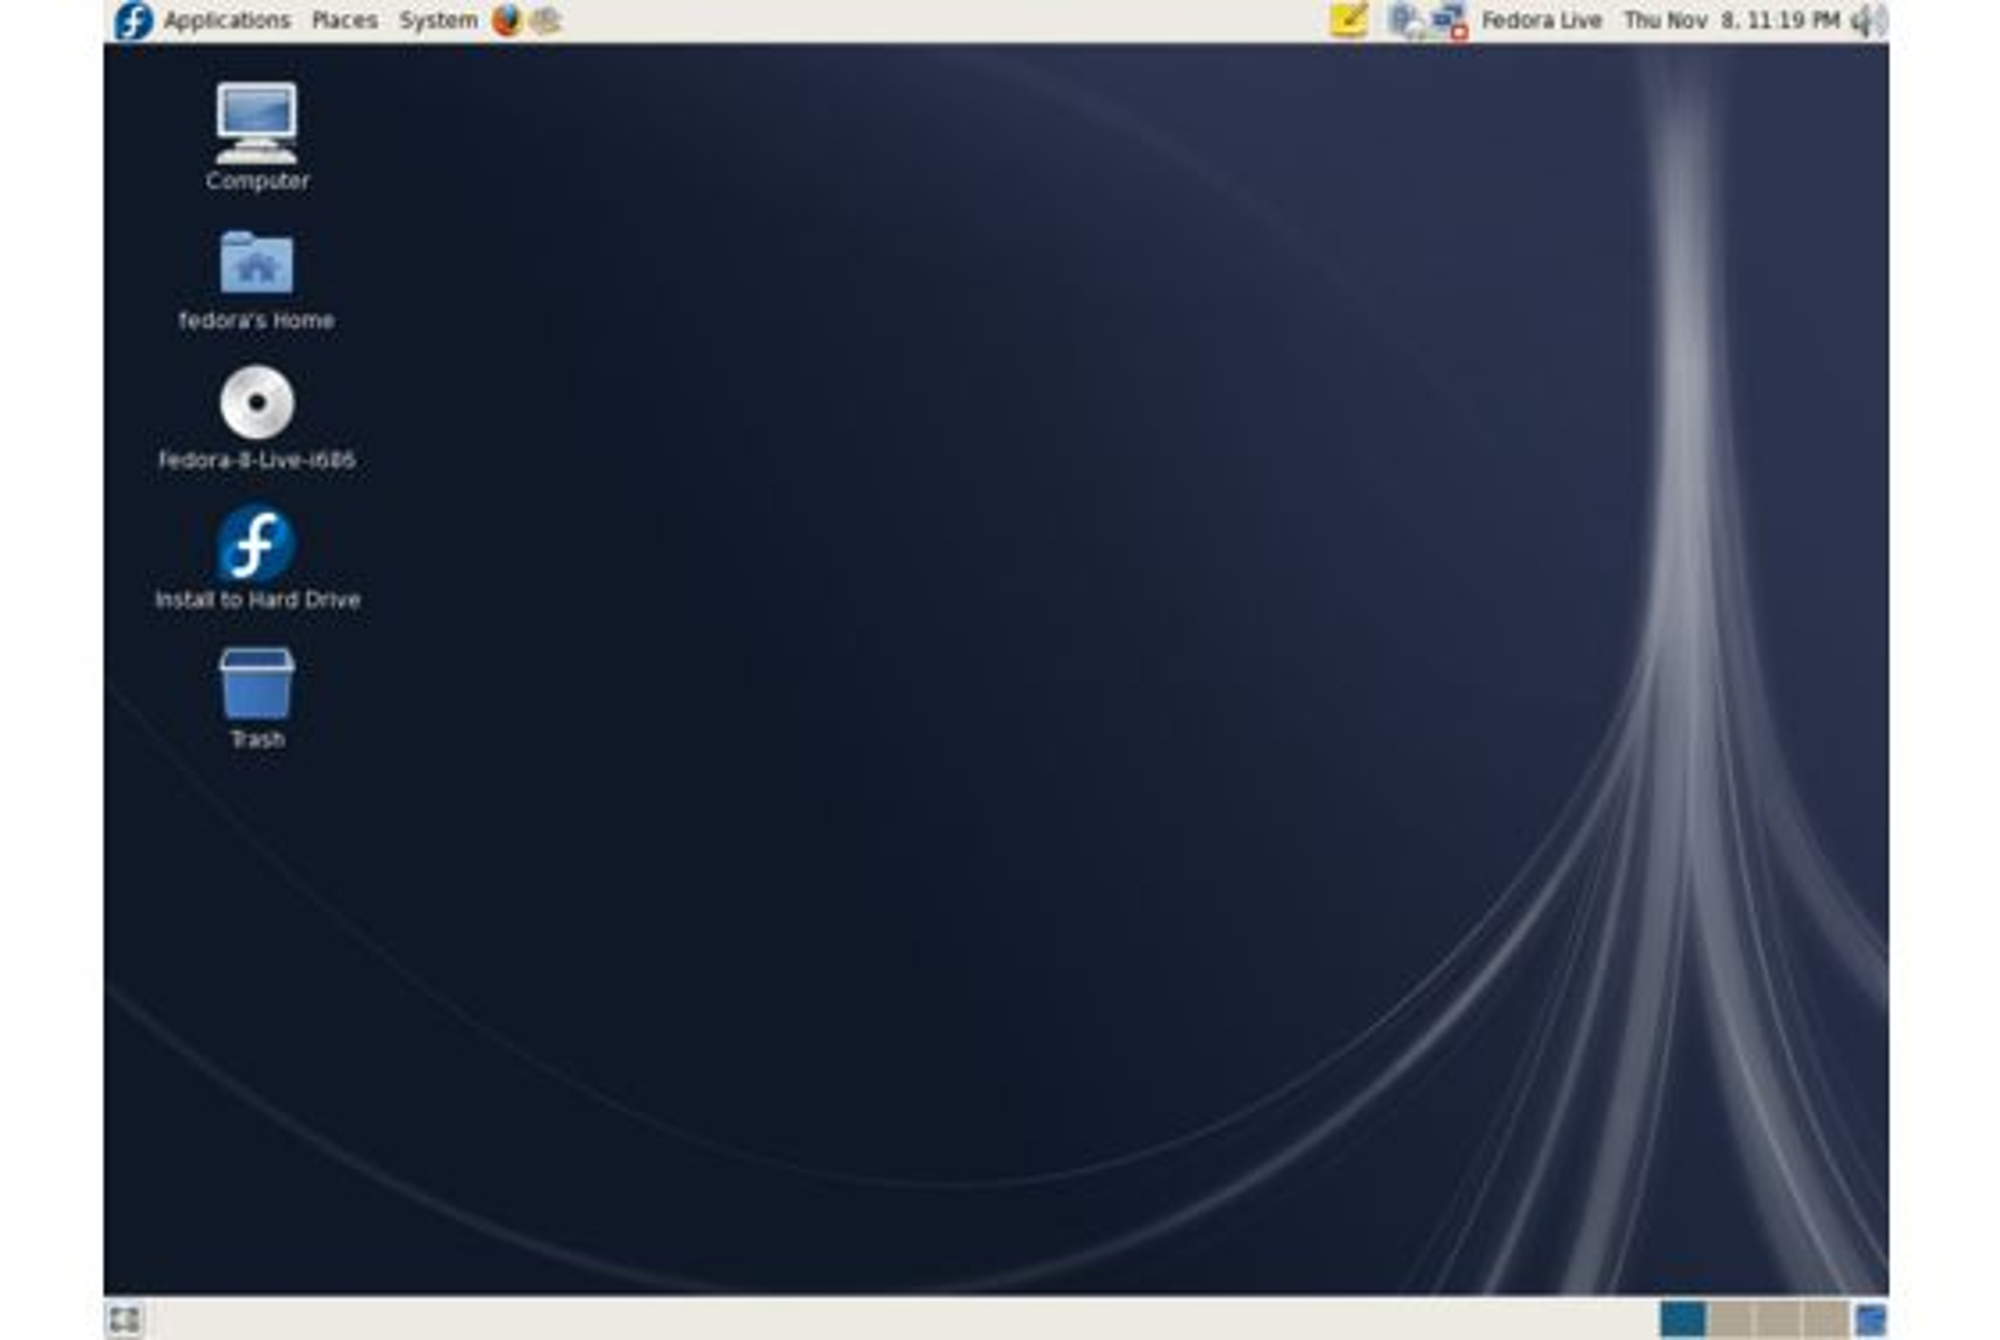 Fedora 8 med Gnome skrivebordsmiljø